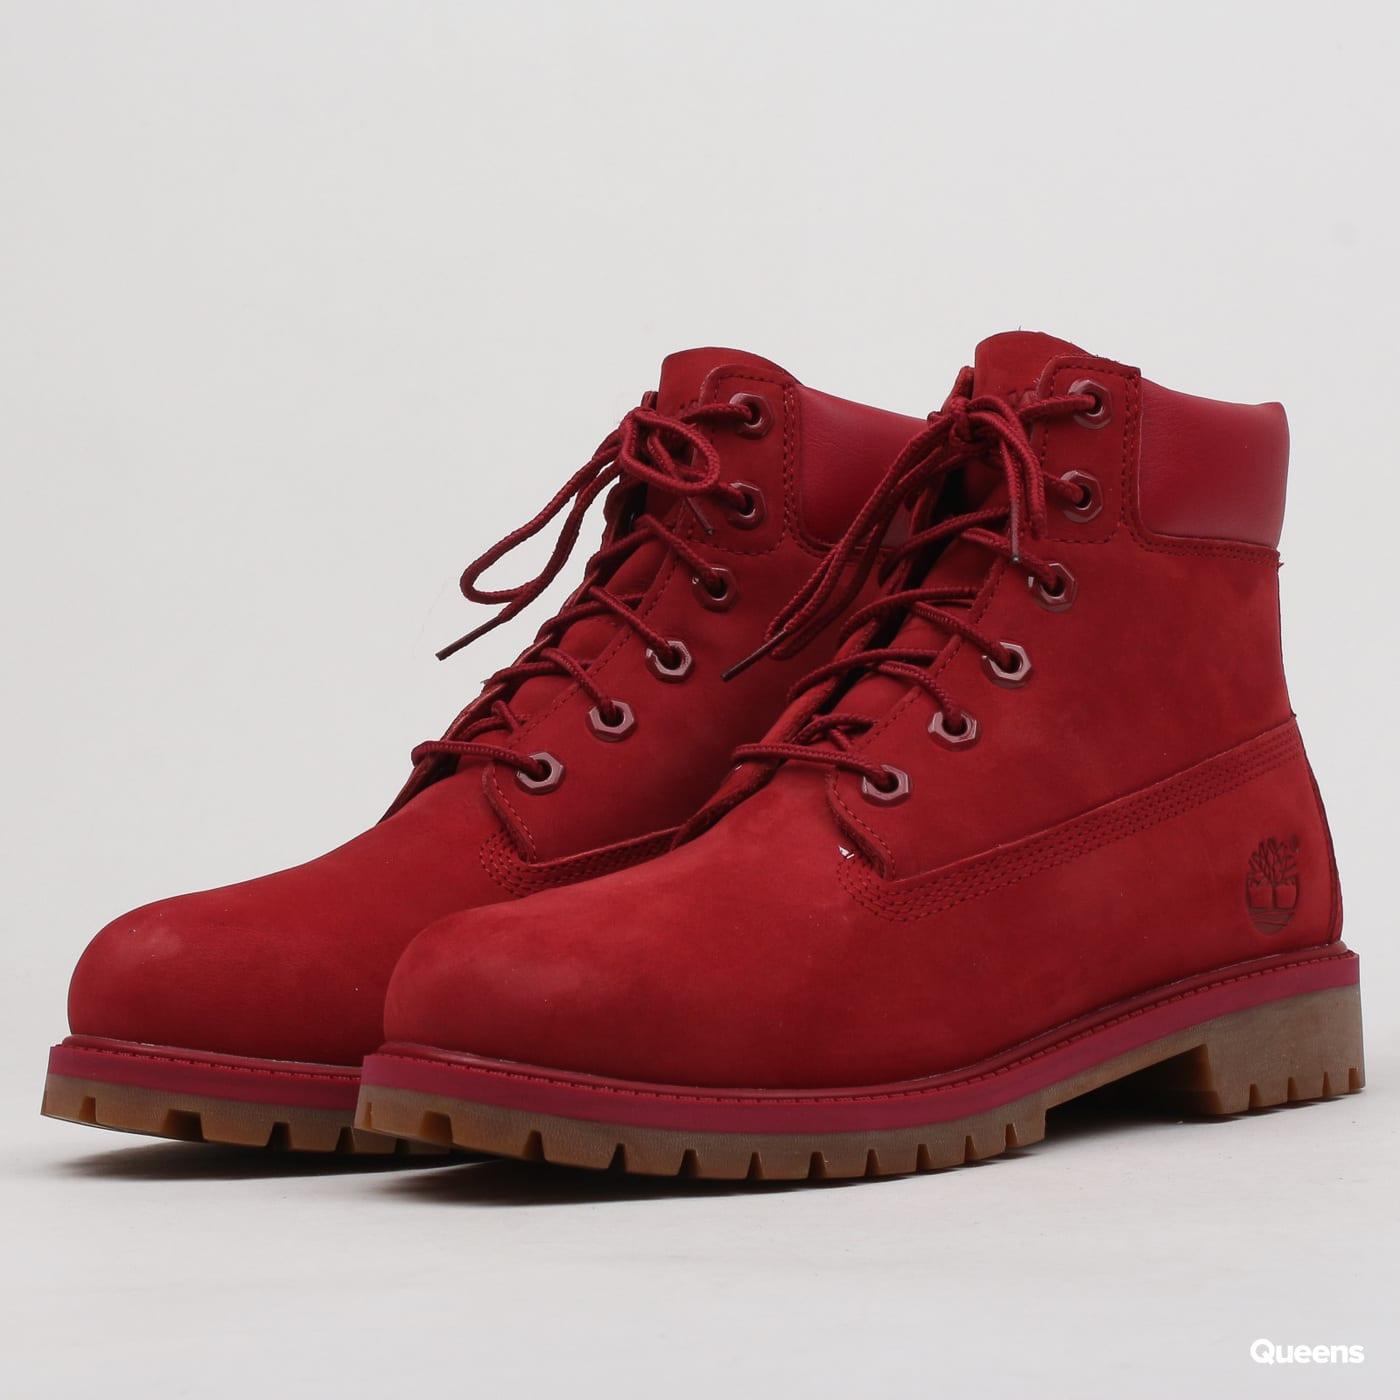 6029d181ef4 Dámské zimní boty Timberland 6 Inch Premium WP Boot (A13HV - RED) – Queens  💚